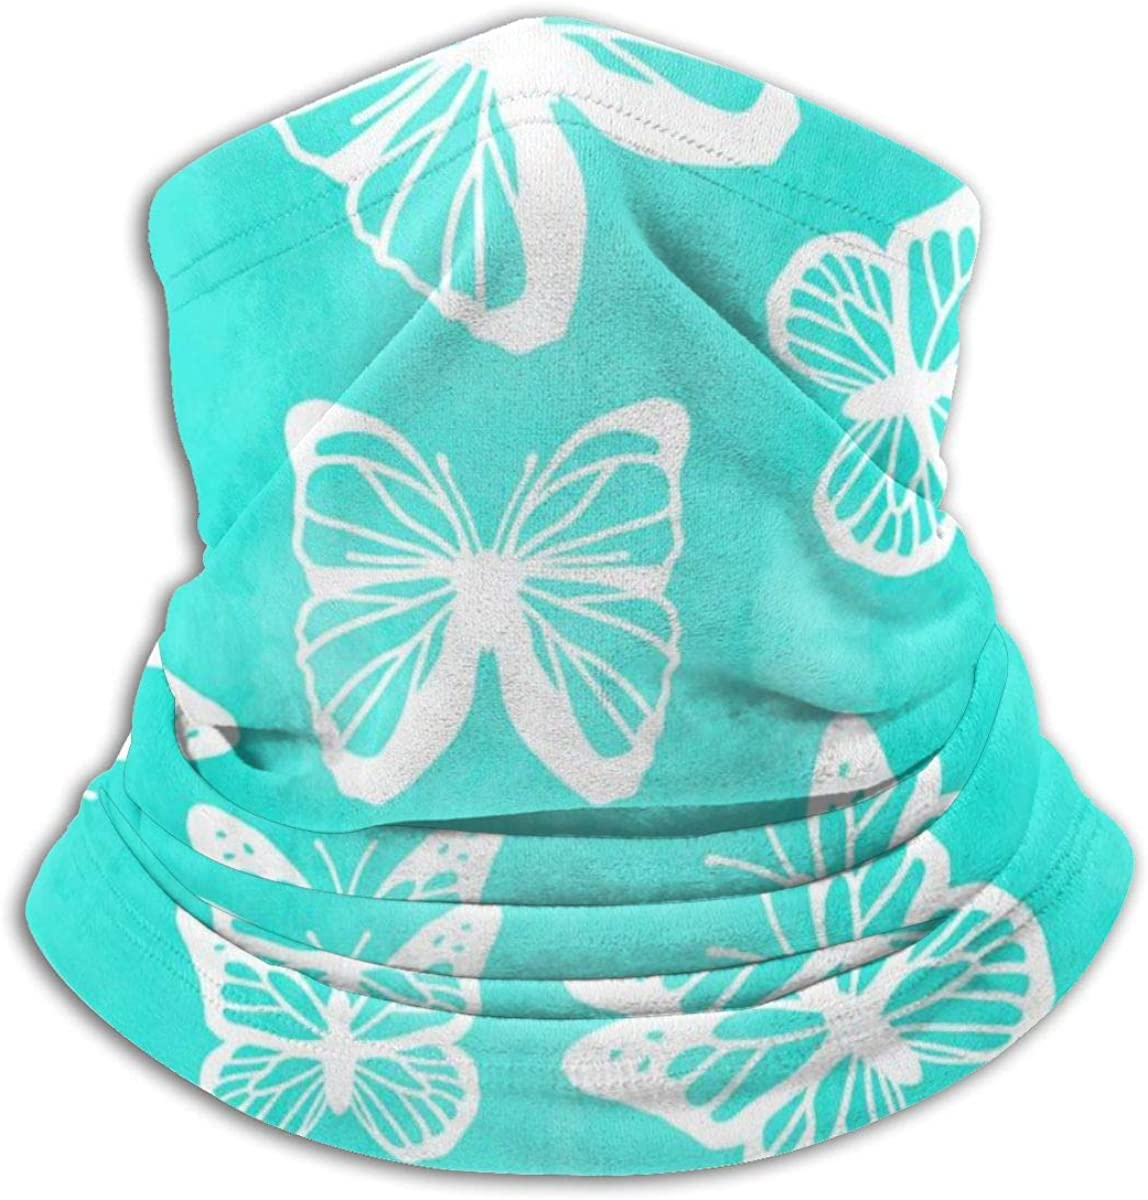 SLHFPX Neck Gaiter Face Mask Butterflies Spring Summer Turquoise Half Balaclava Ski Masks for Women Men Adult